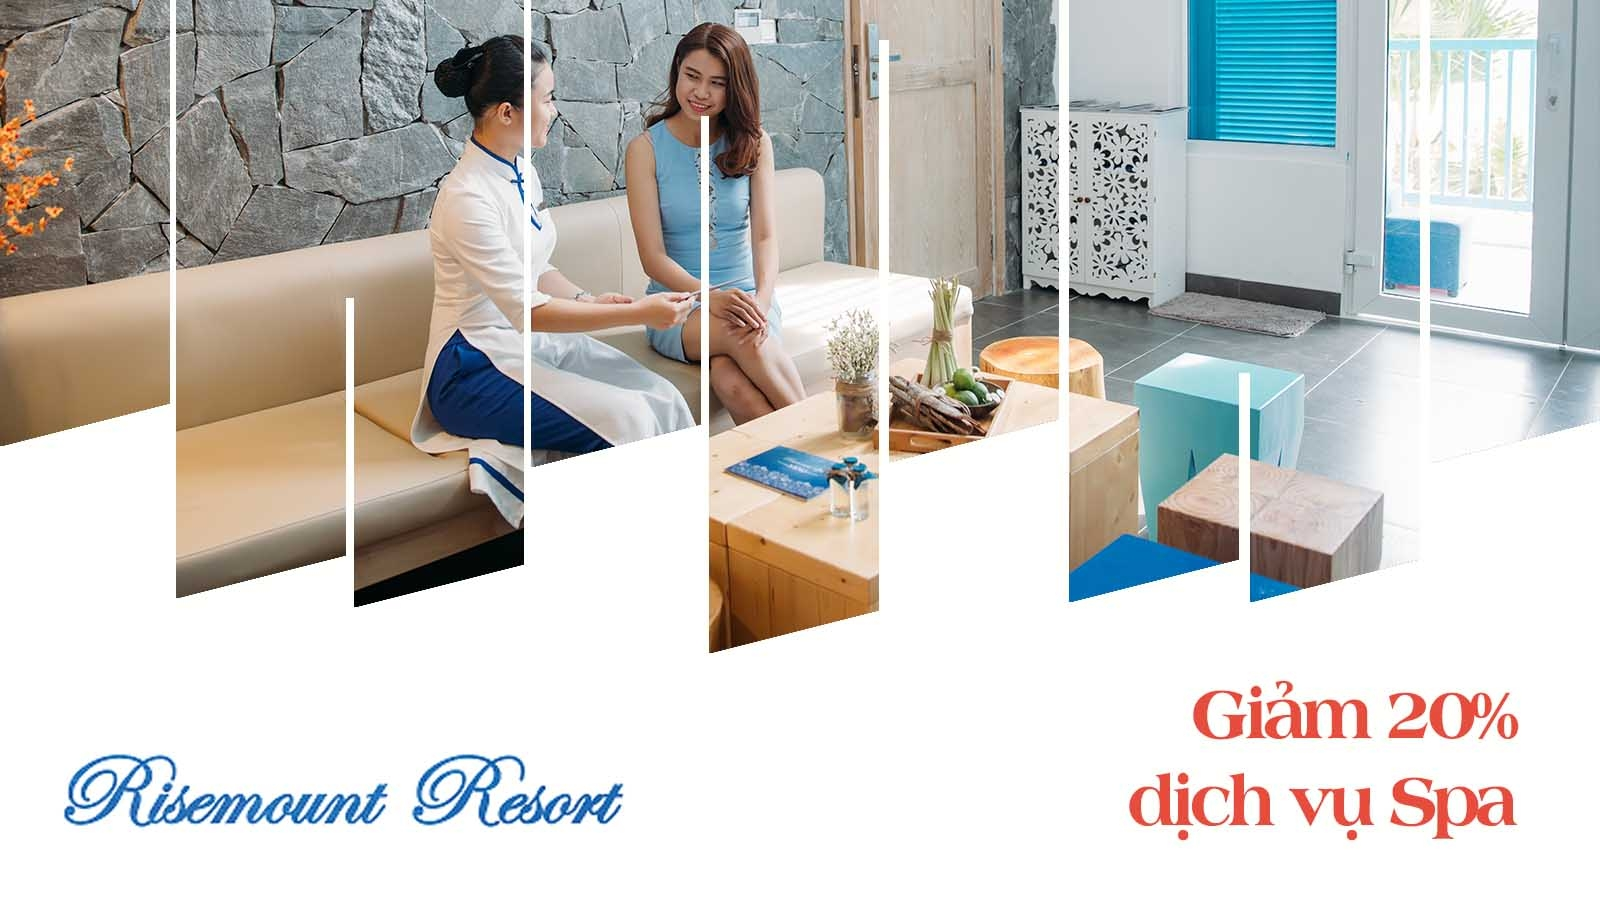 Risemount Resort – Giảm 20% dịch vụ Spa1